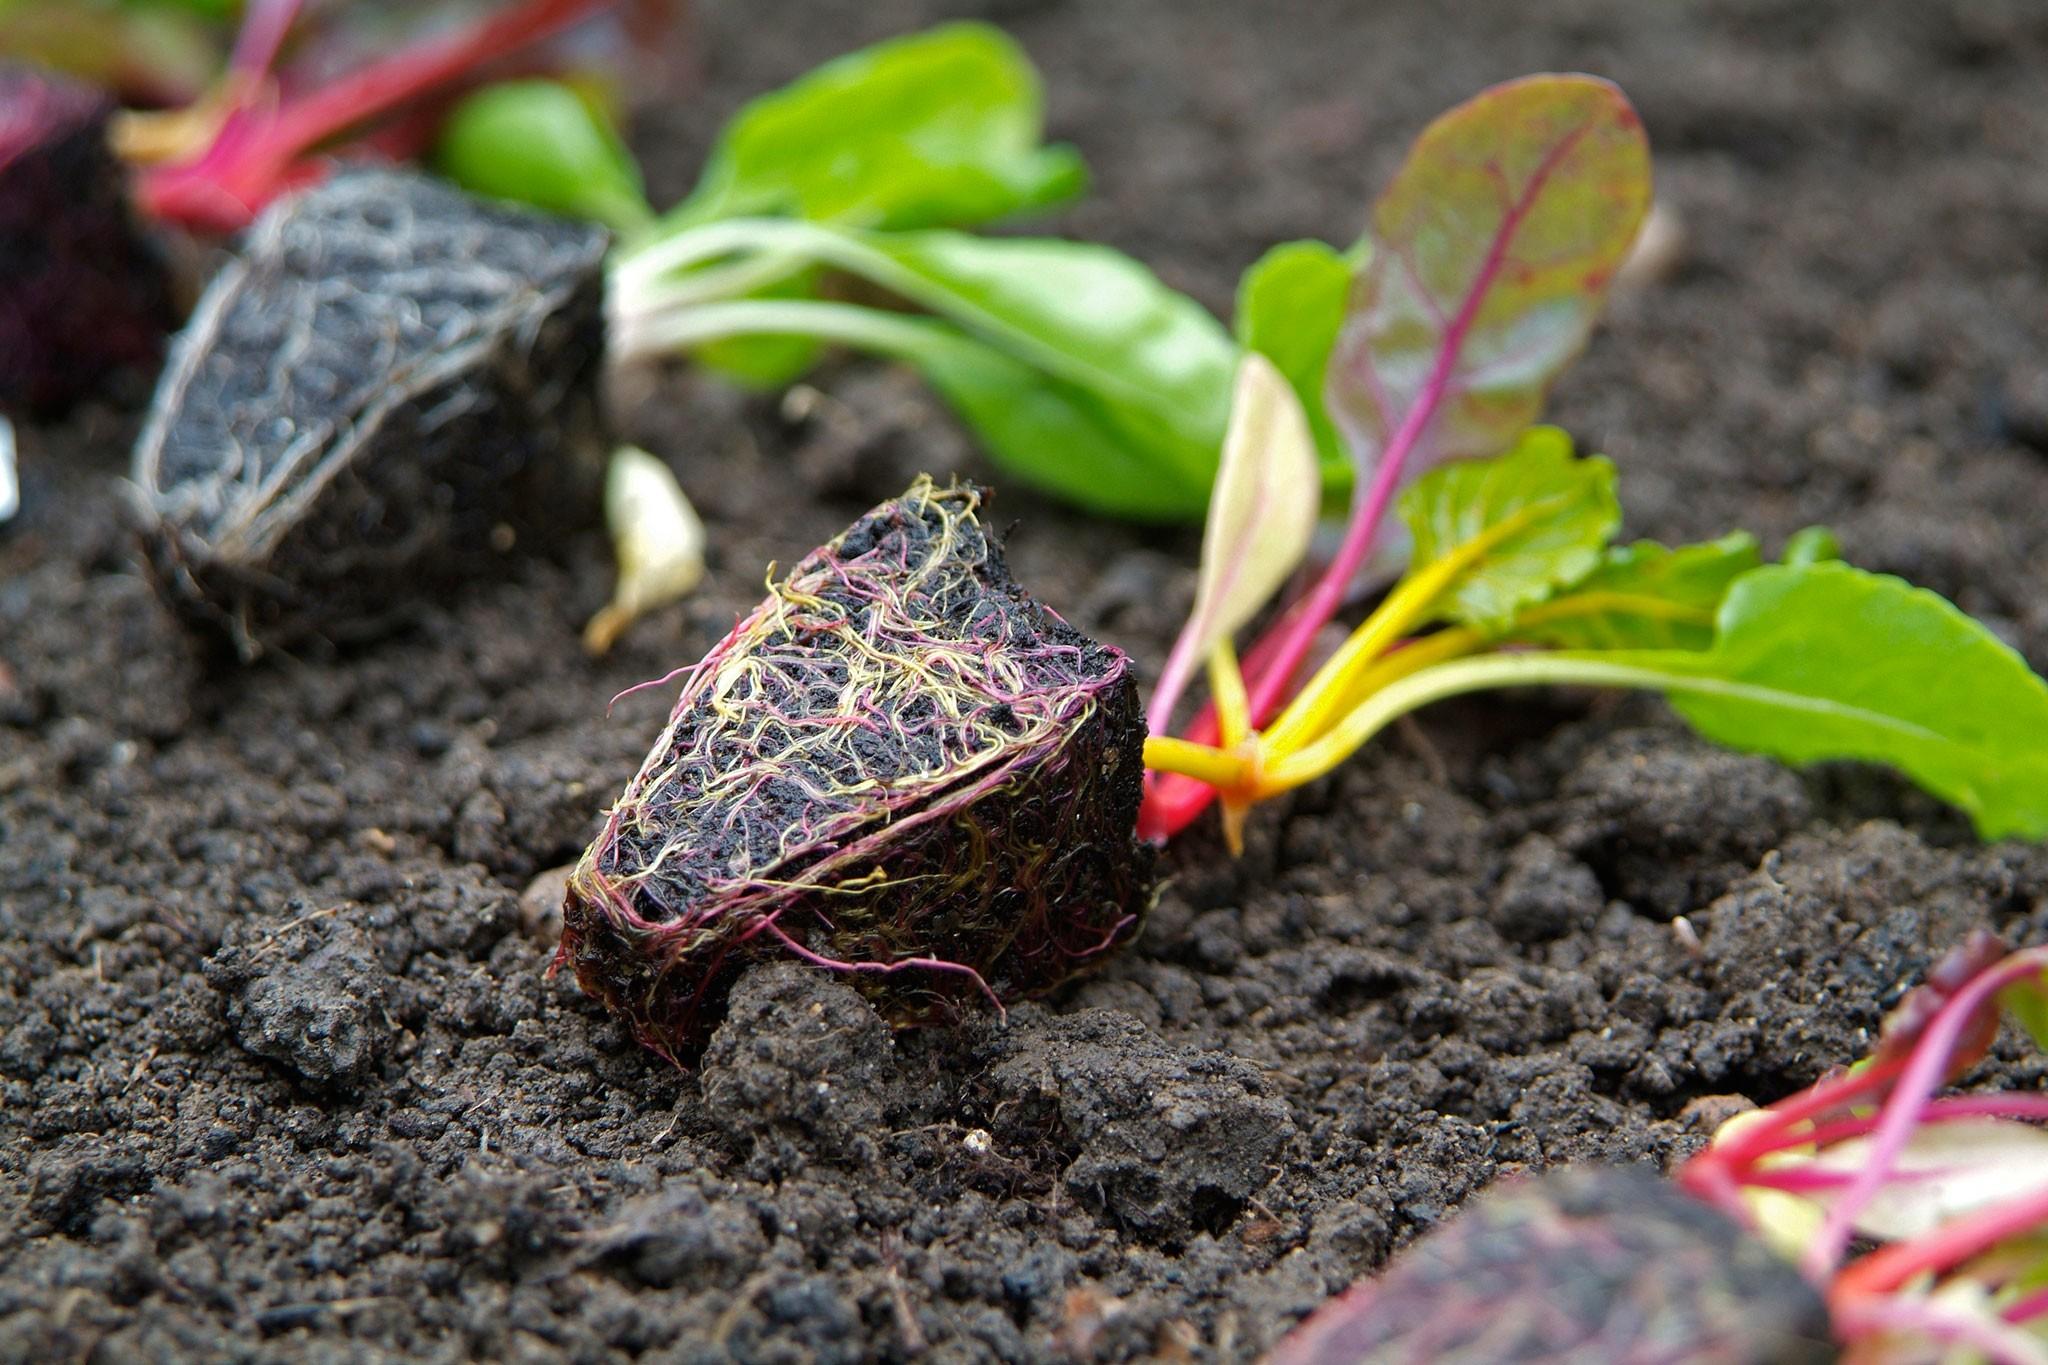 Grow Vegetable Plugs